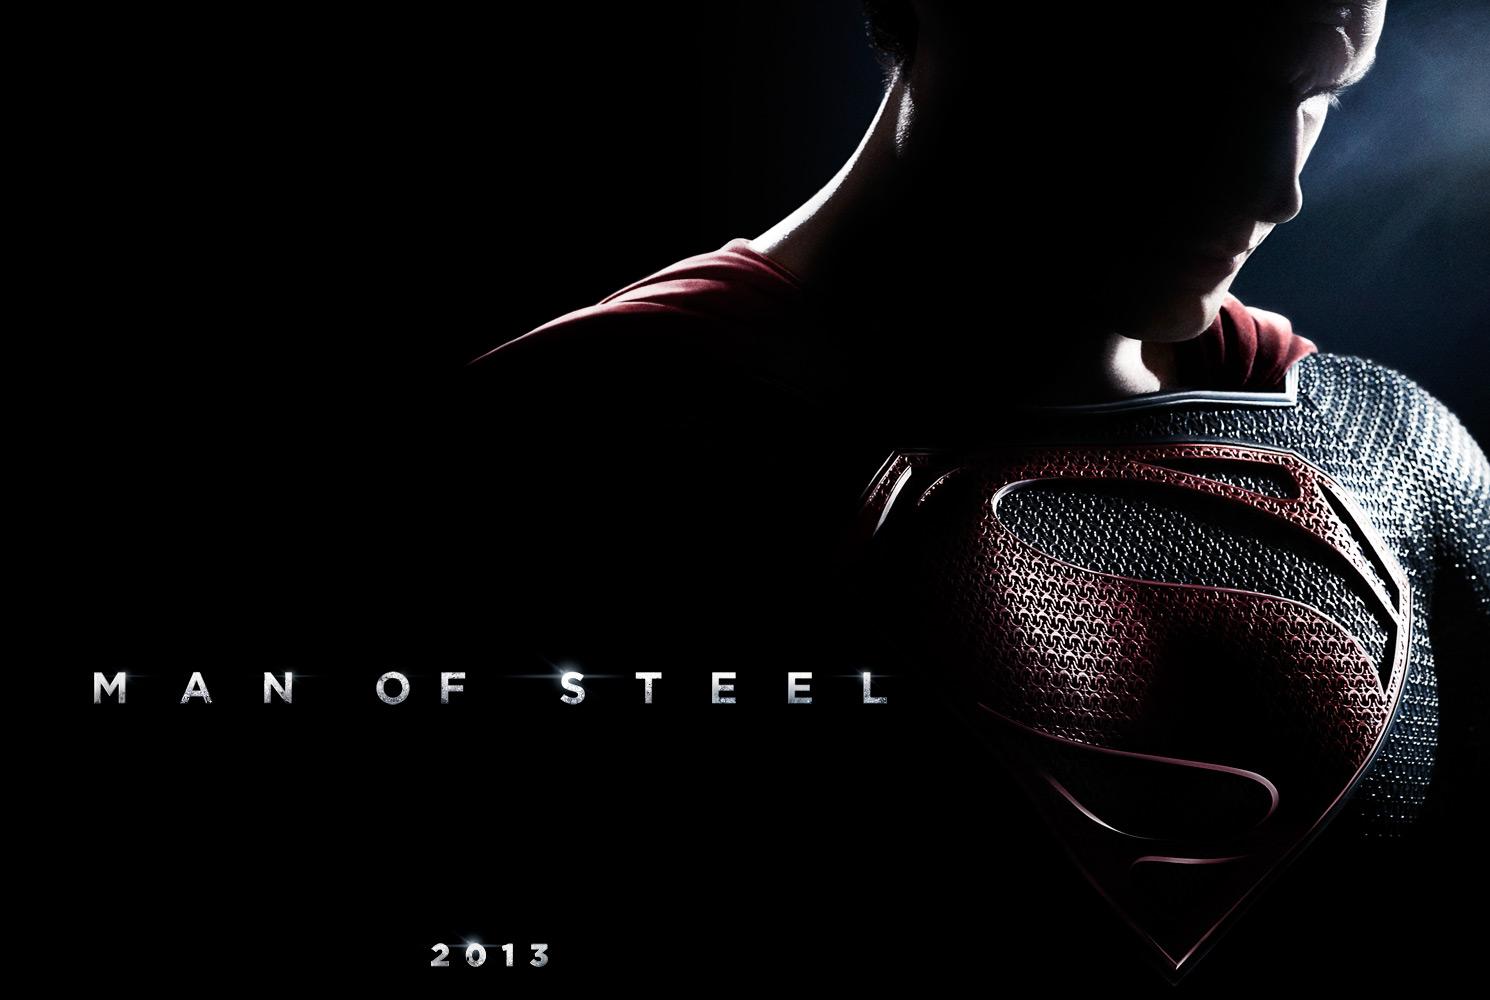 http://dontforgetatowel.com/wp-content/uploads/2012/09/man-of-steel-banner.jpg